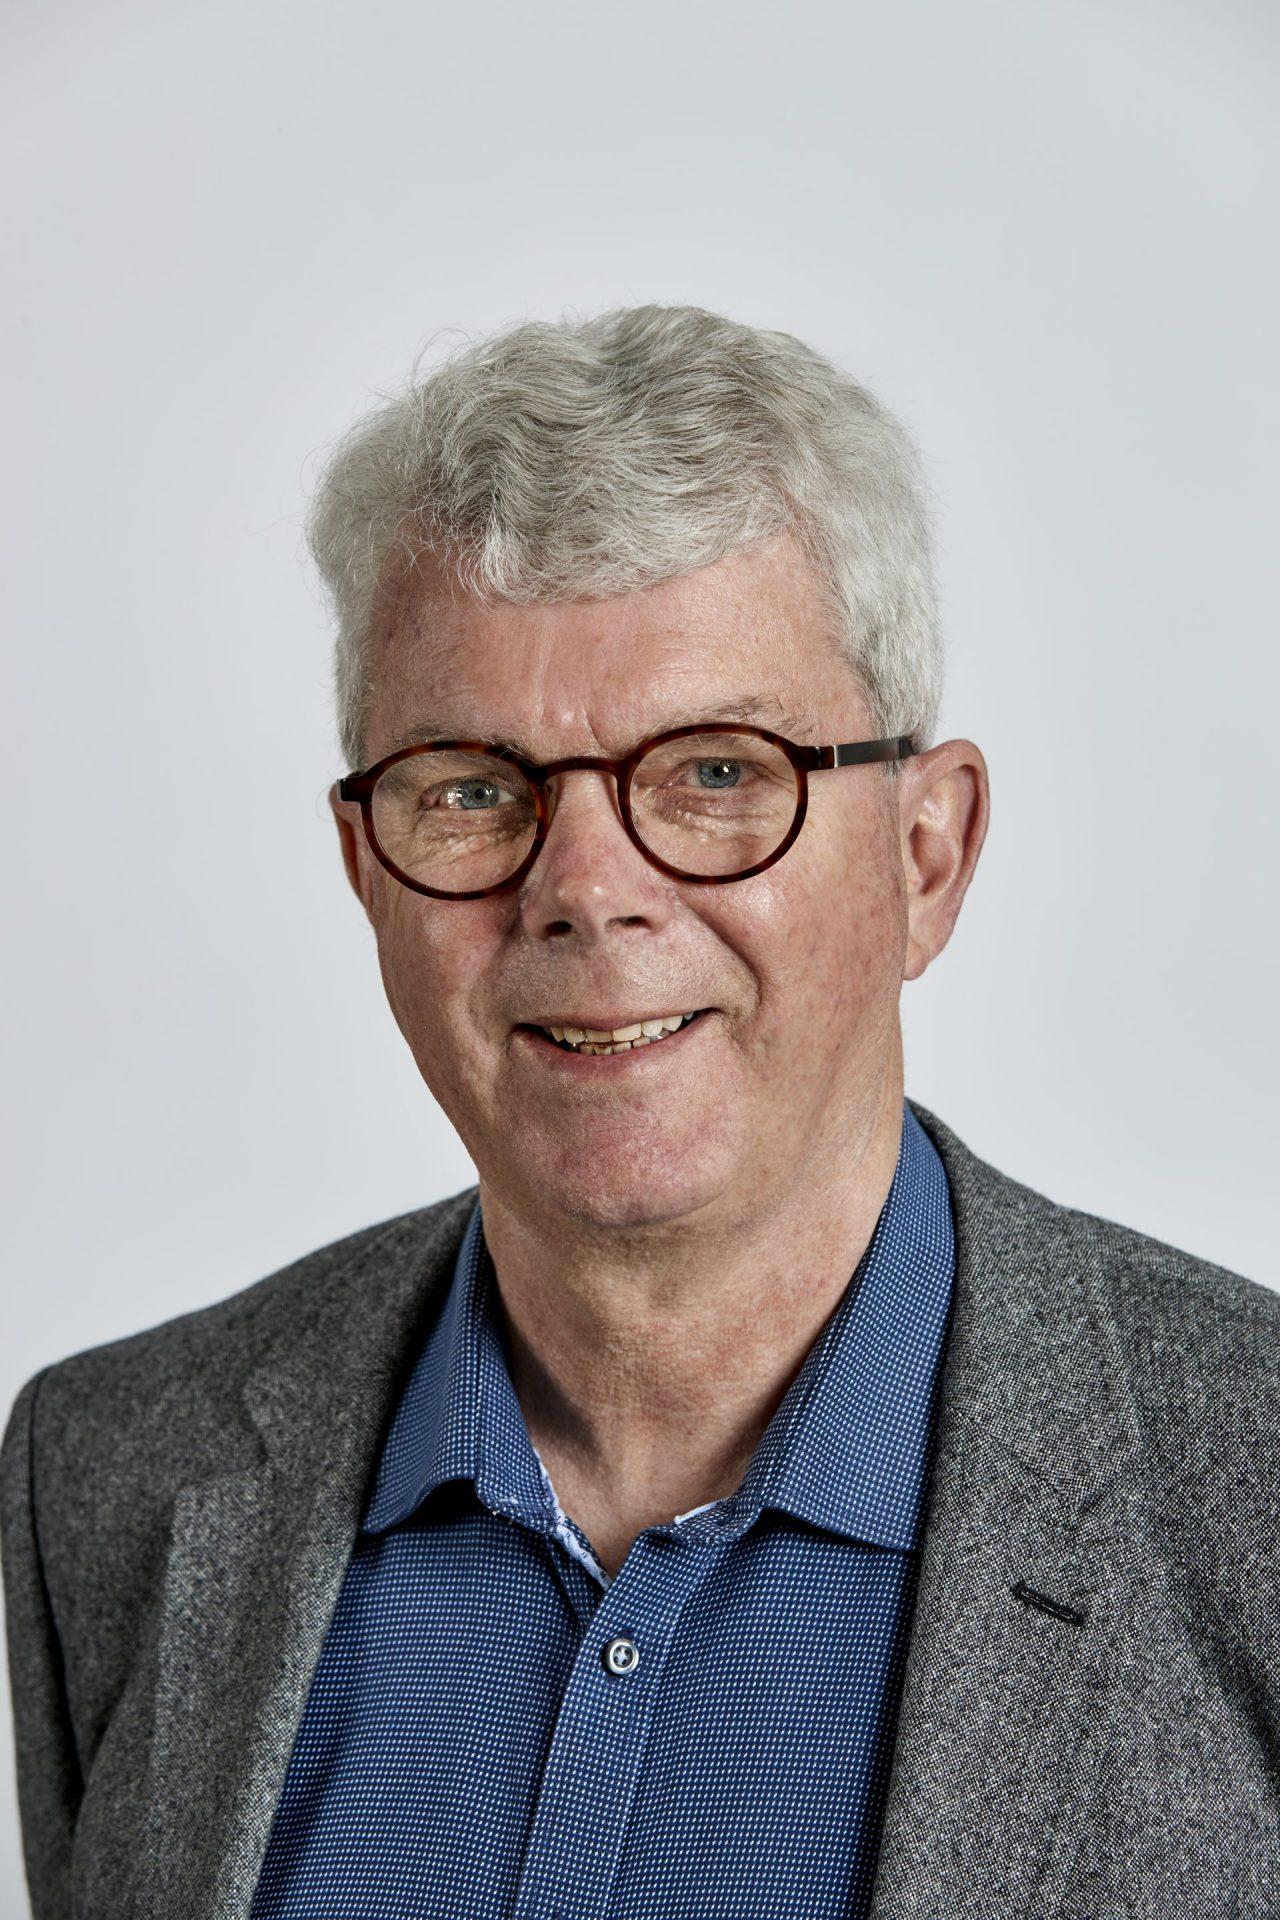 Venstre Horsens Niels Arne Kjærgaard